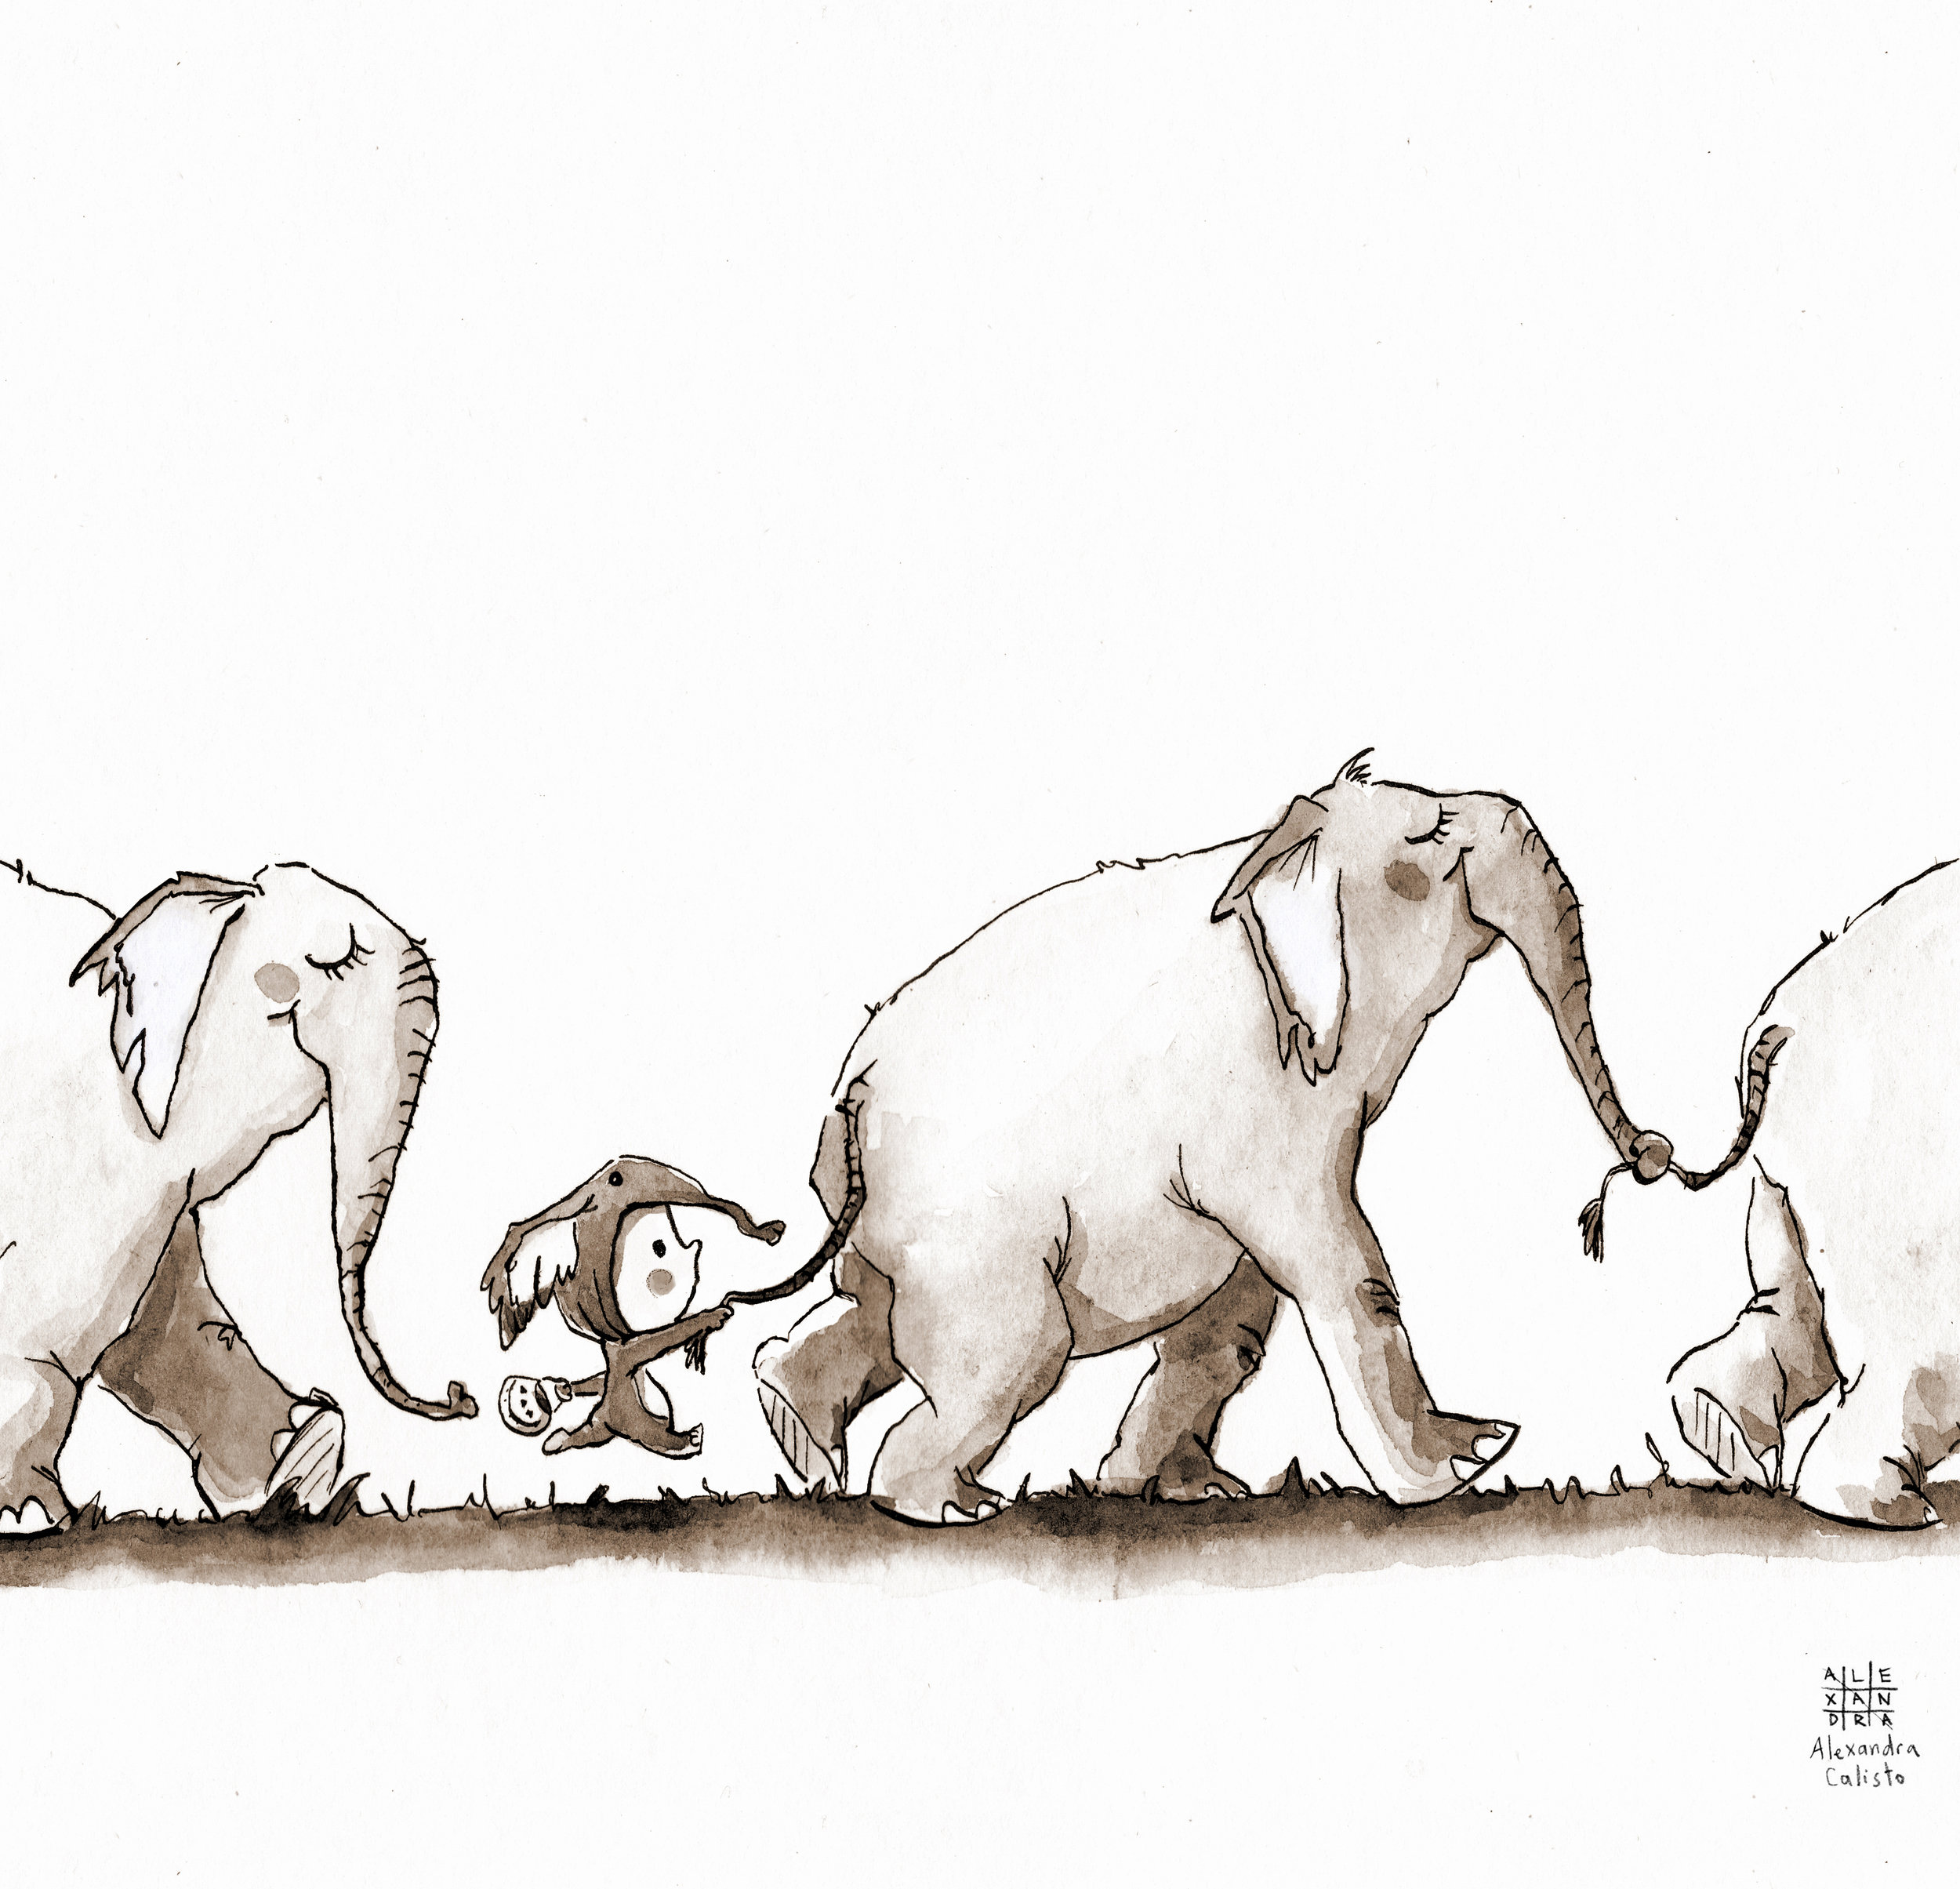 illustration, ink, tinta china, alexandra calisto, elephants